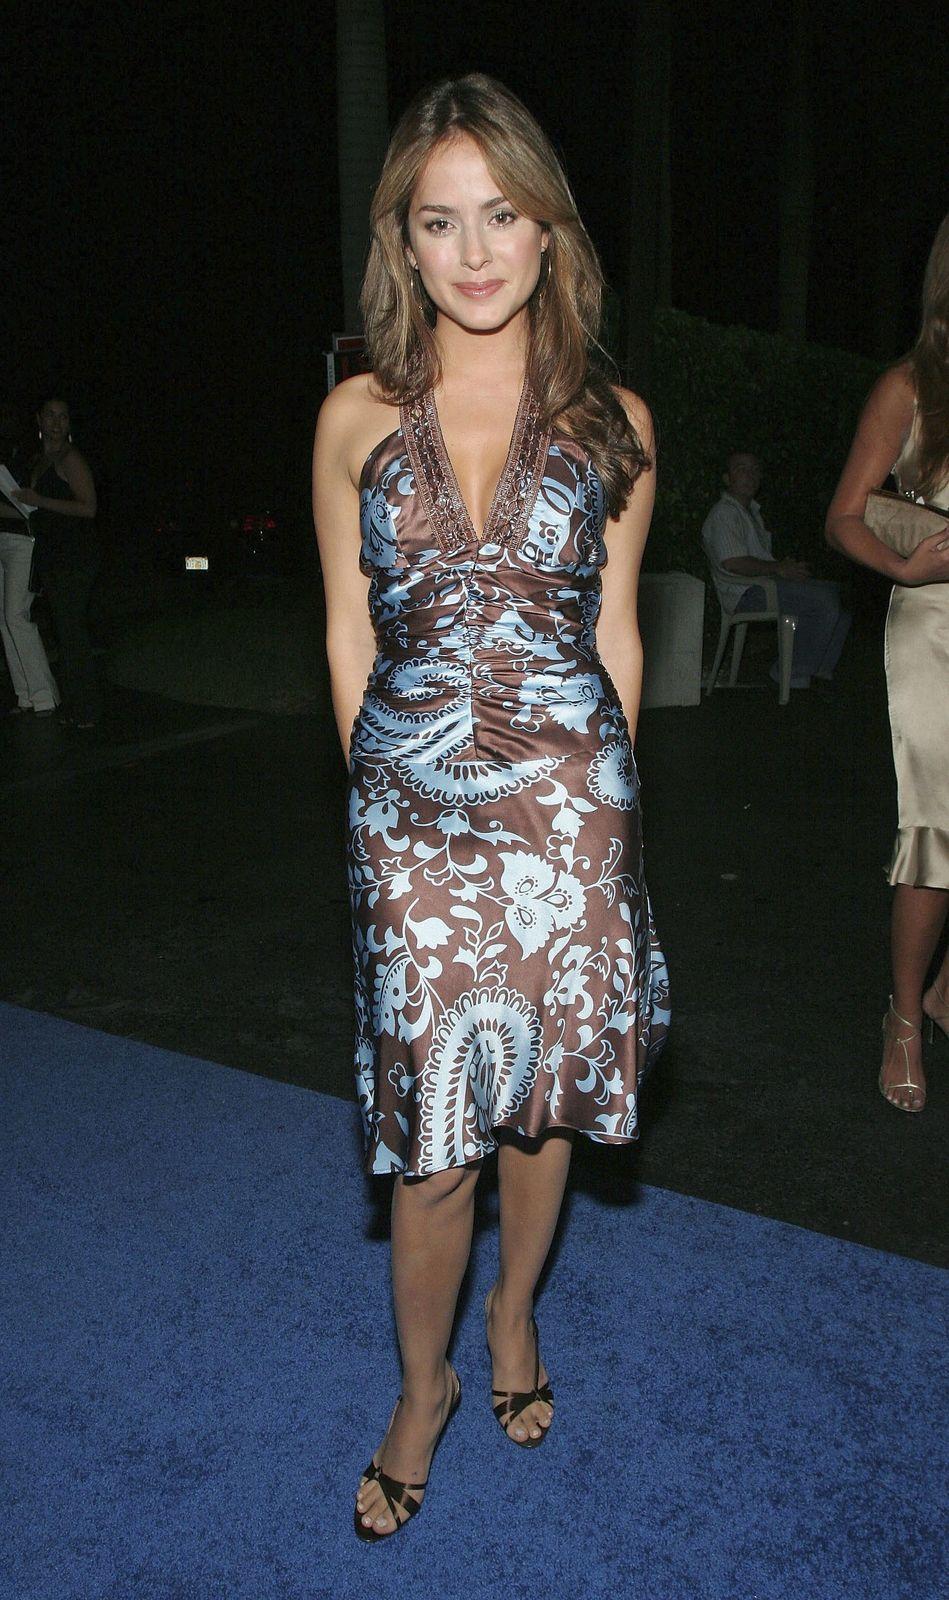 Imagen - Danna-Garca-Feet-61655.jpg | Wiki Mujeres